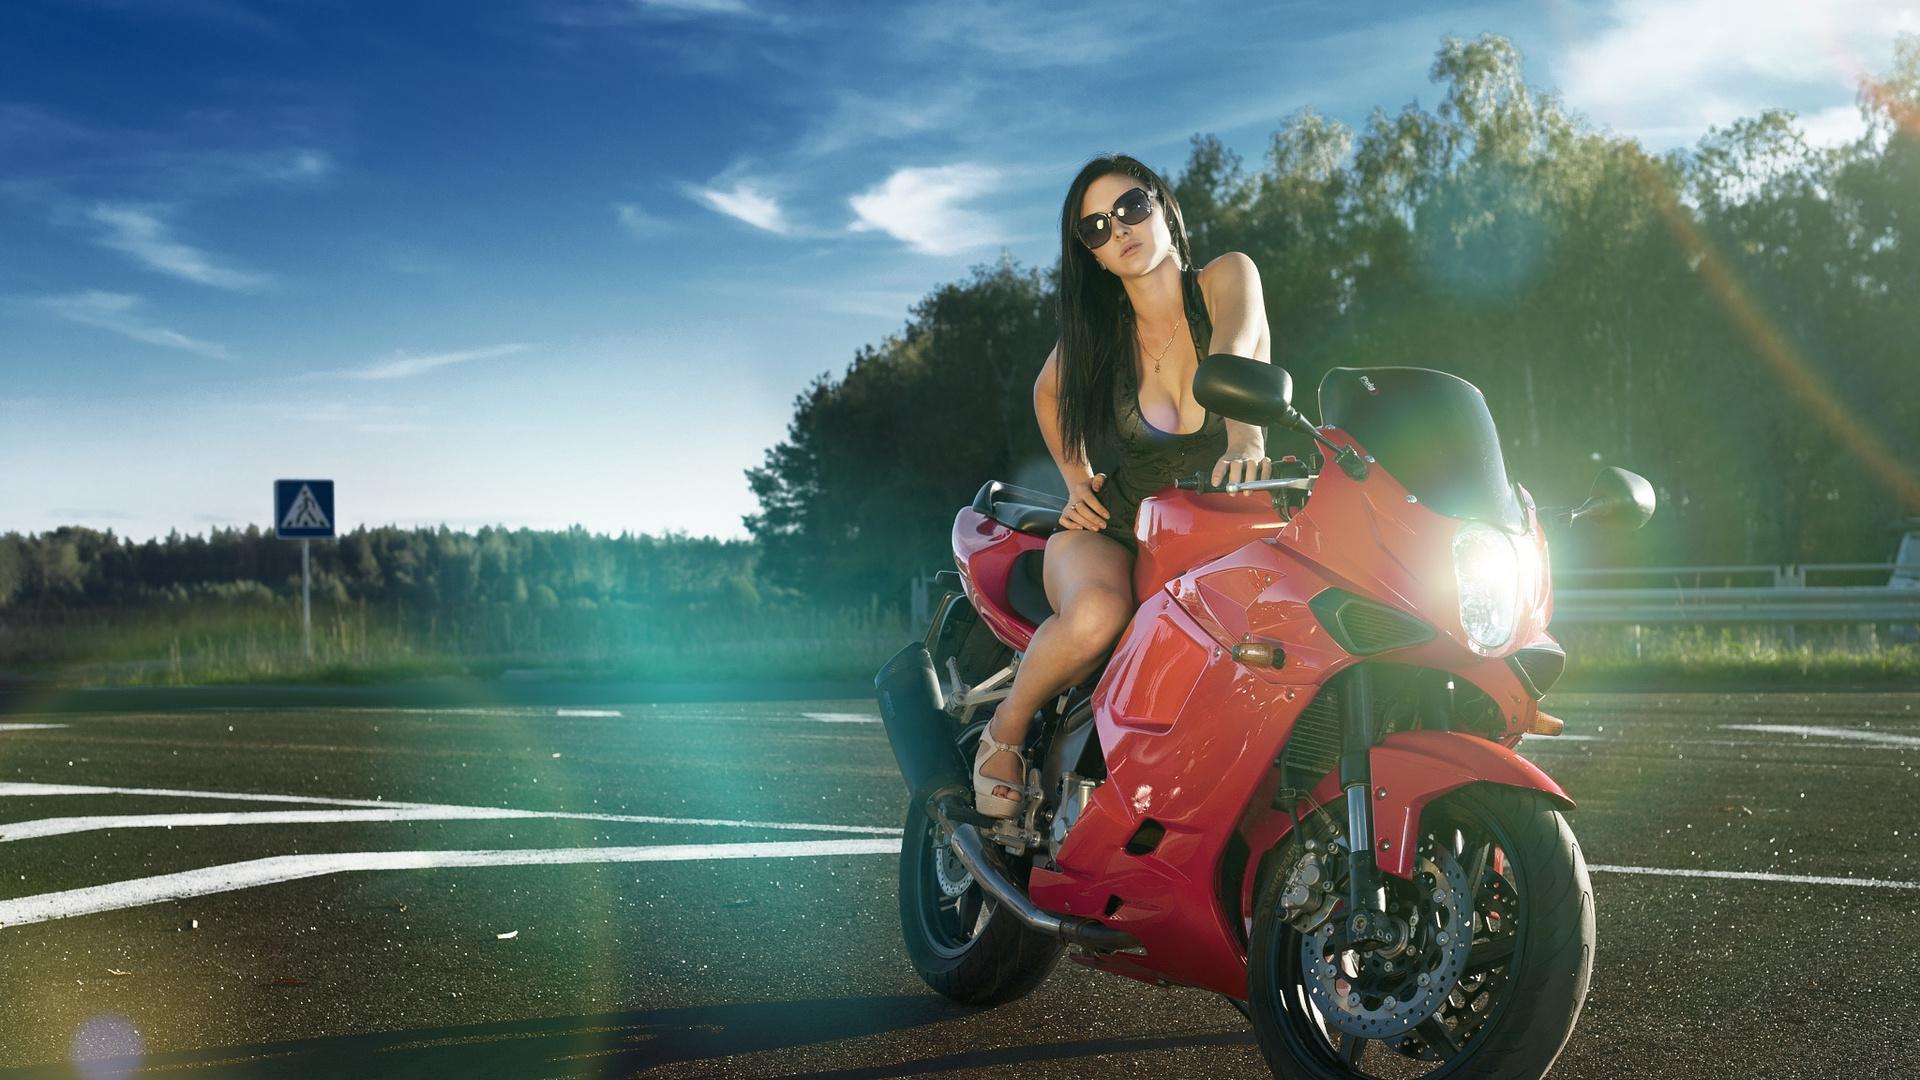 Красавицы на мотоциклах и автомобилях фото — photo 12